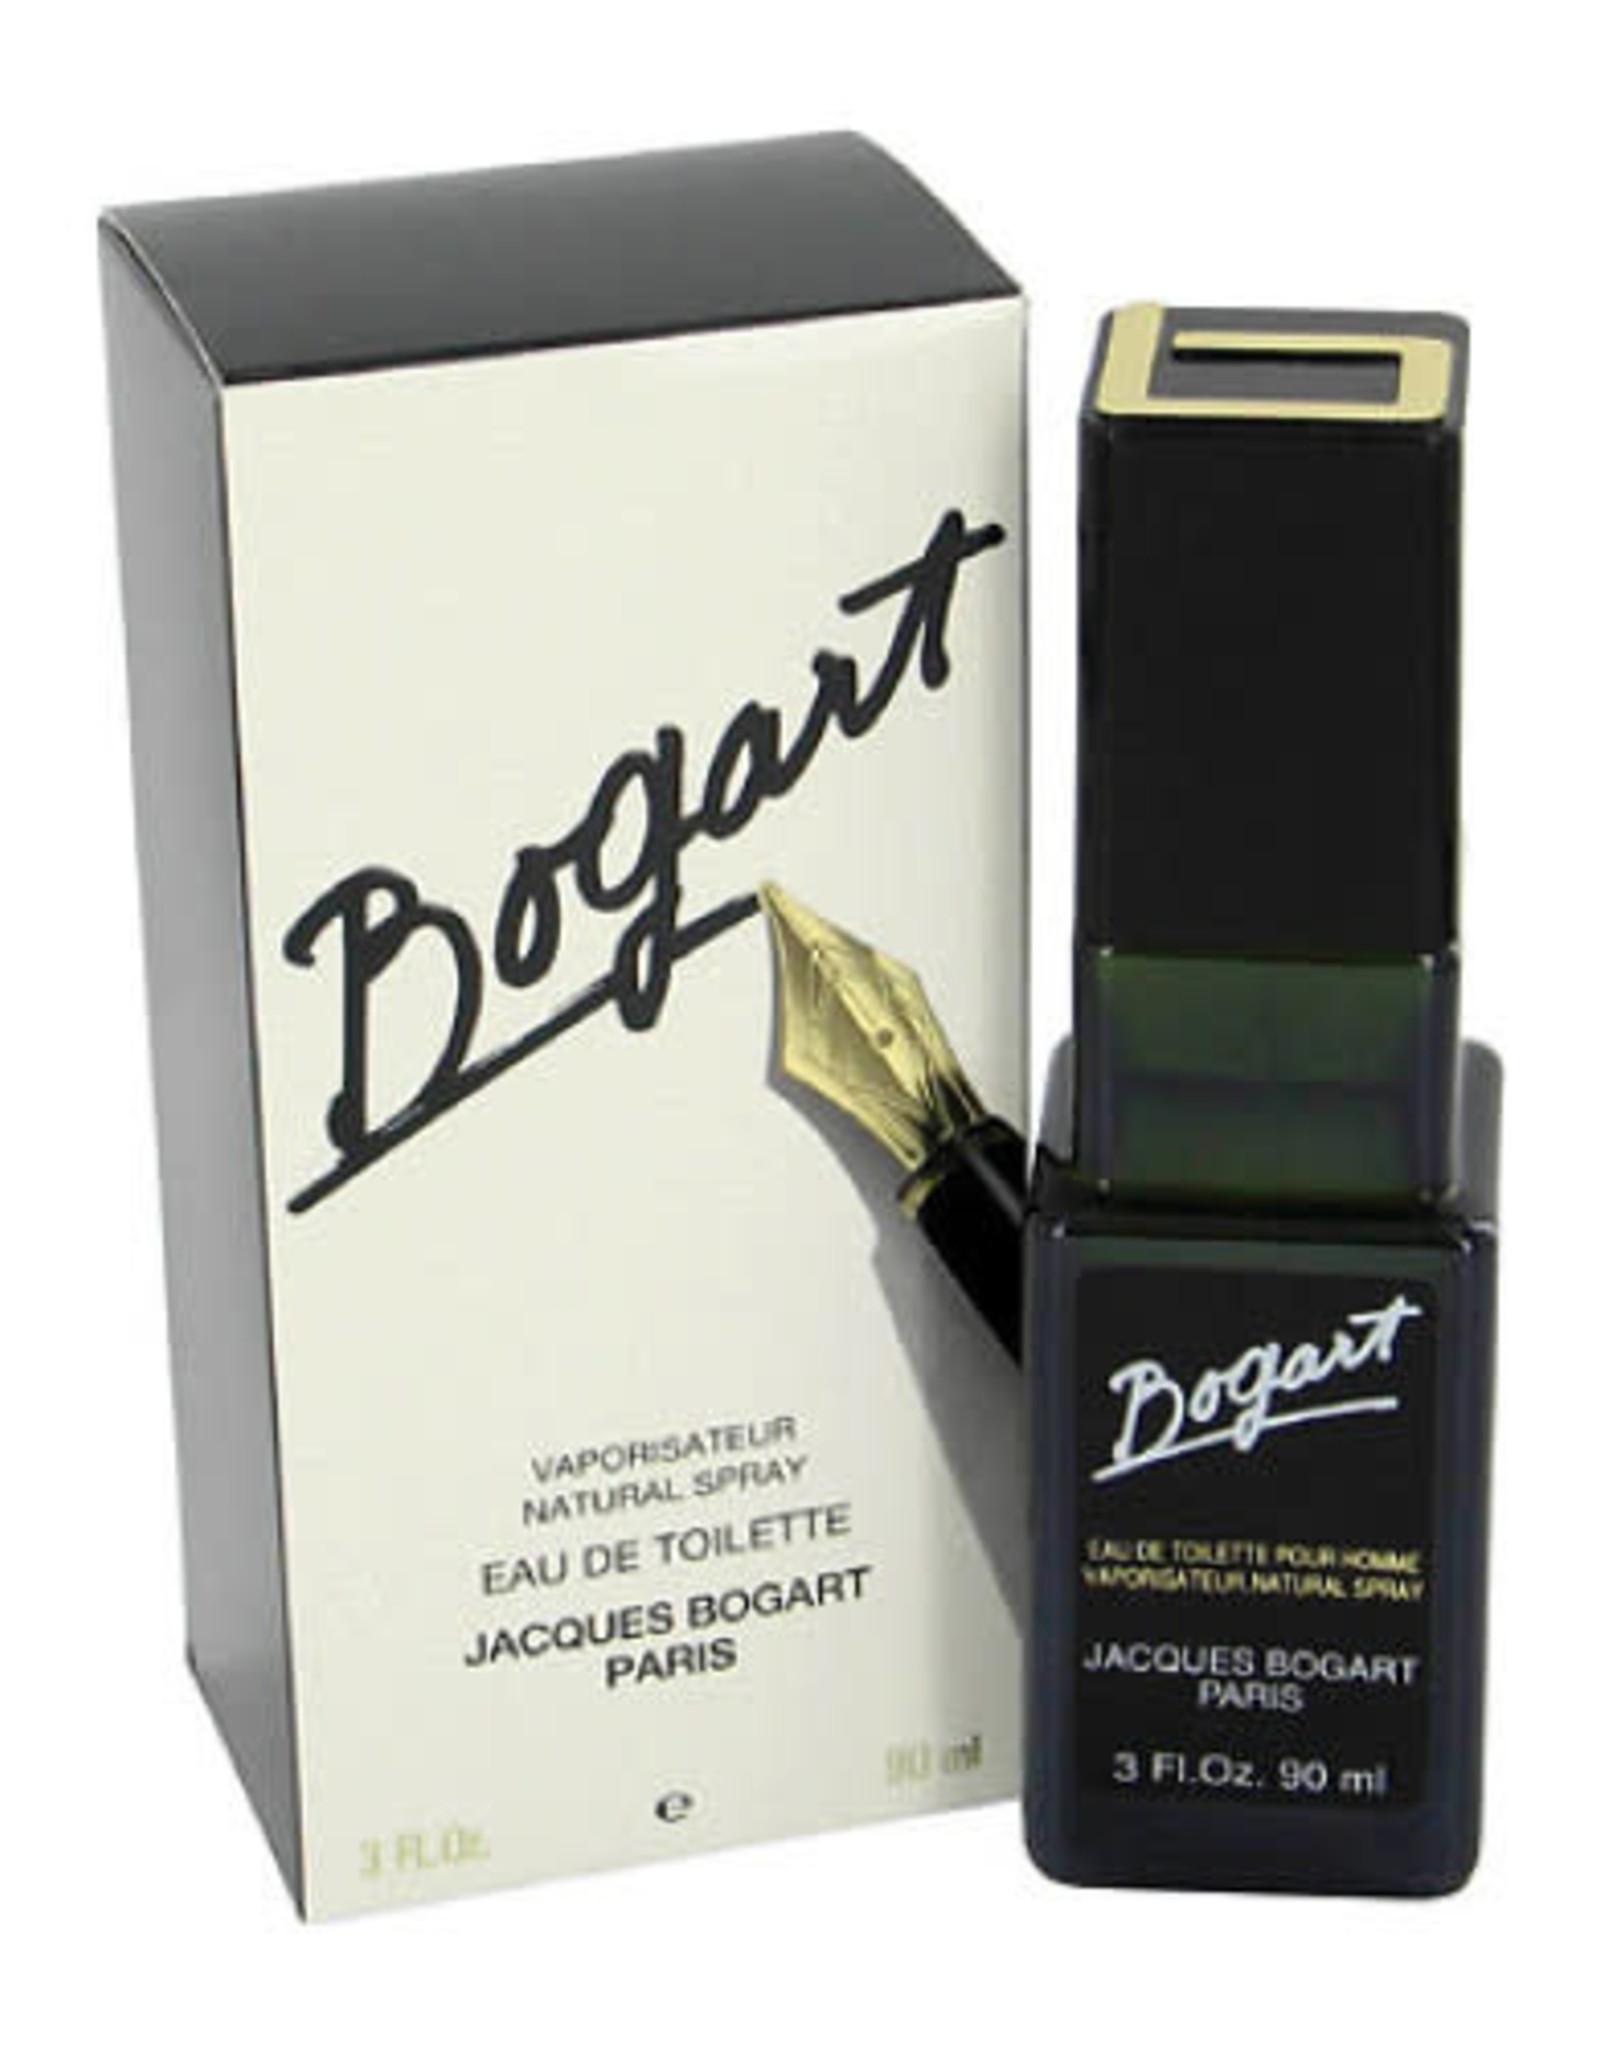 JACQUES BOGART JACQUES BOGART BOGART